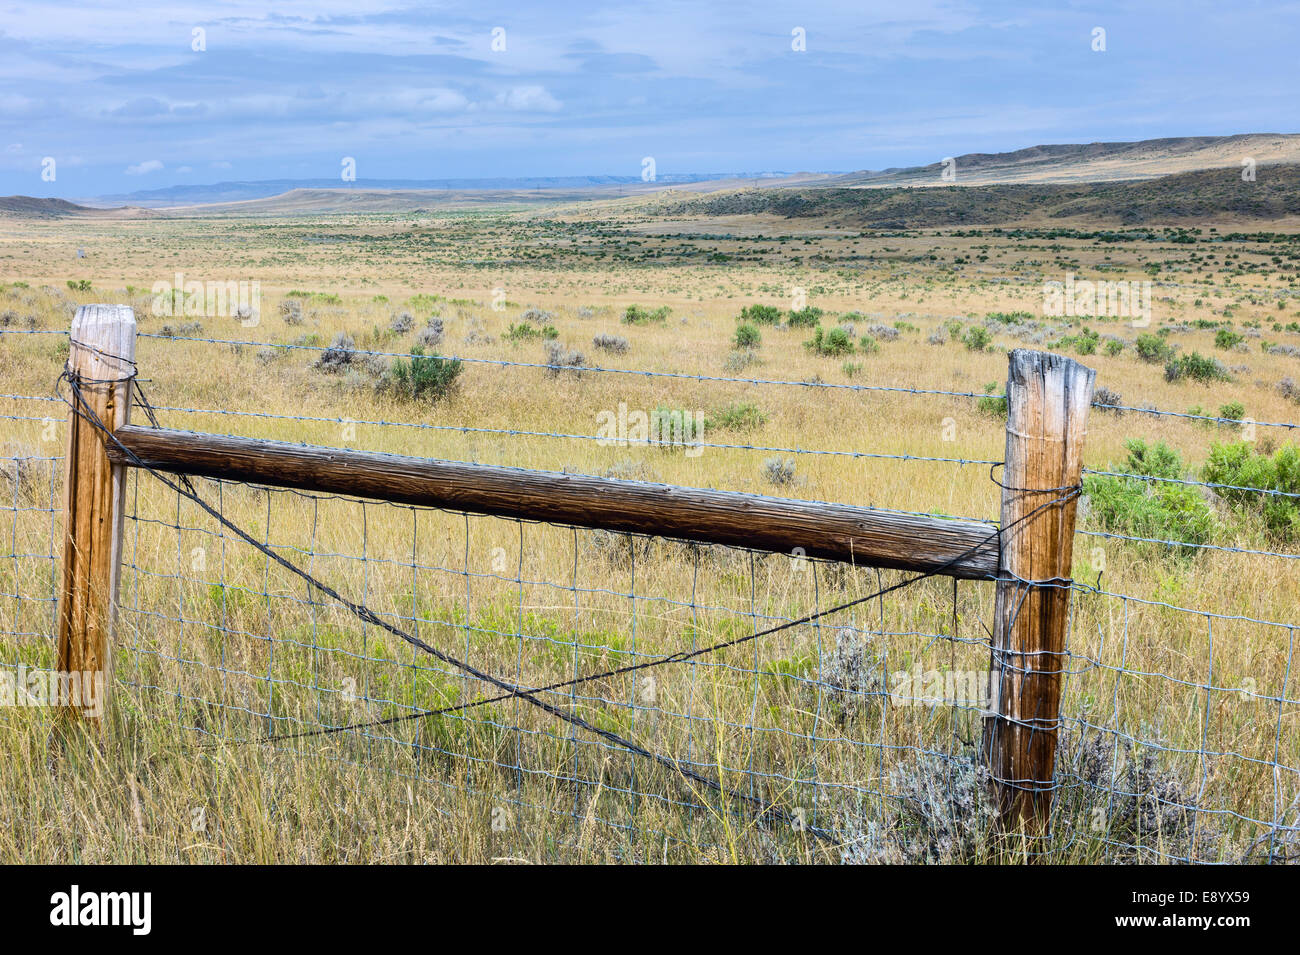 Open prairie, grassland, and dry scrub and hills under a bright sky near Vermillion, Nebraska, USA. Stock Photo